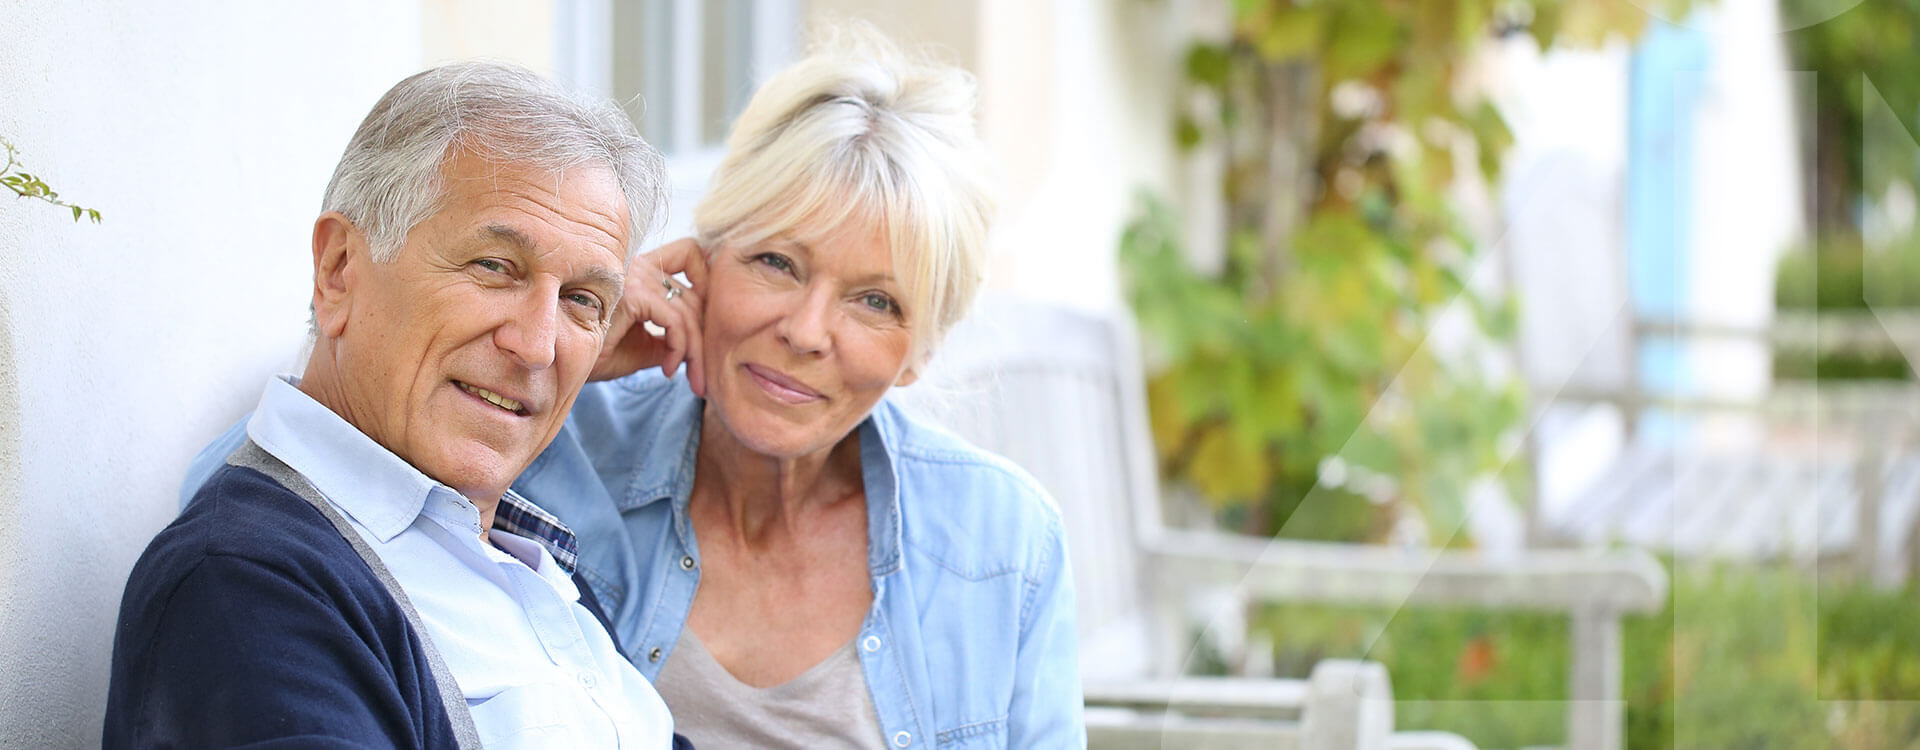 Senioren Immobilien Rente Duisburg